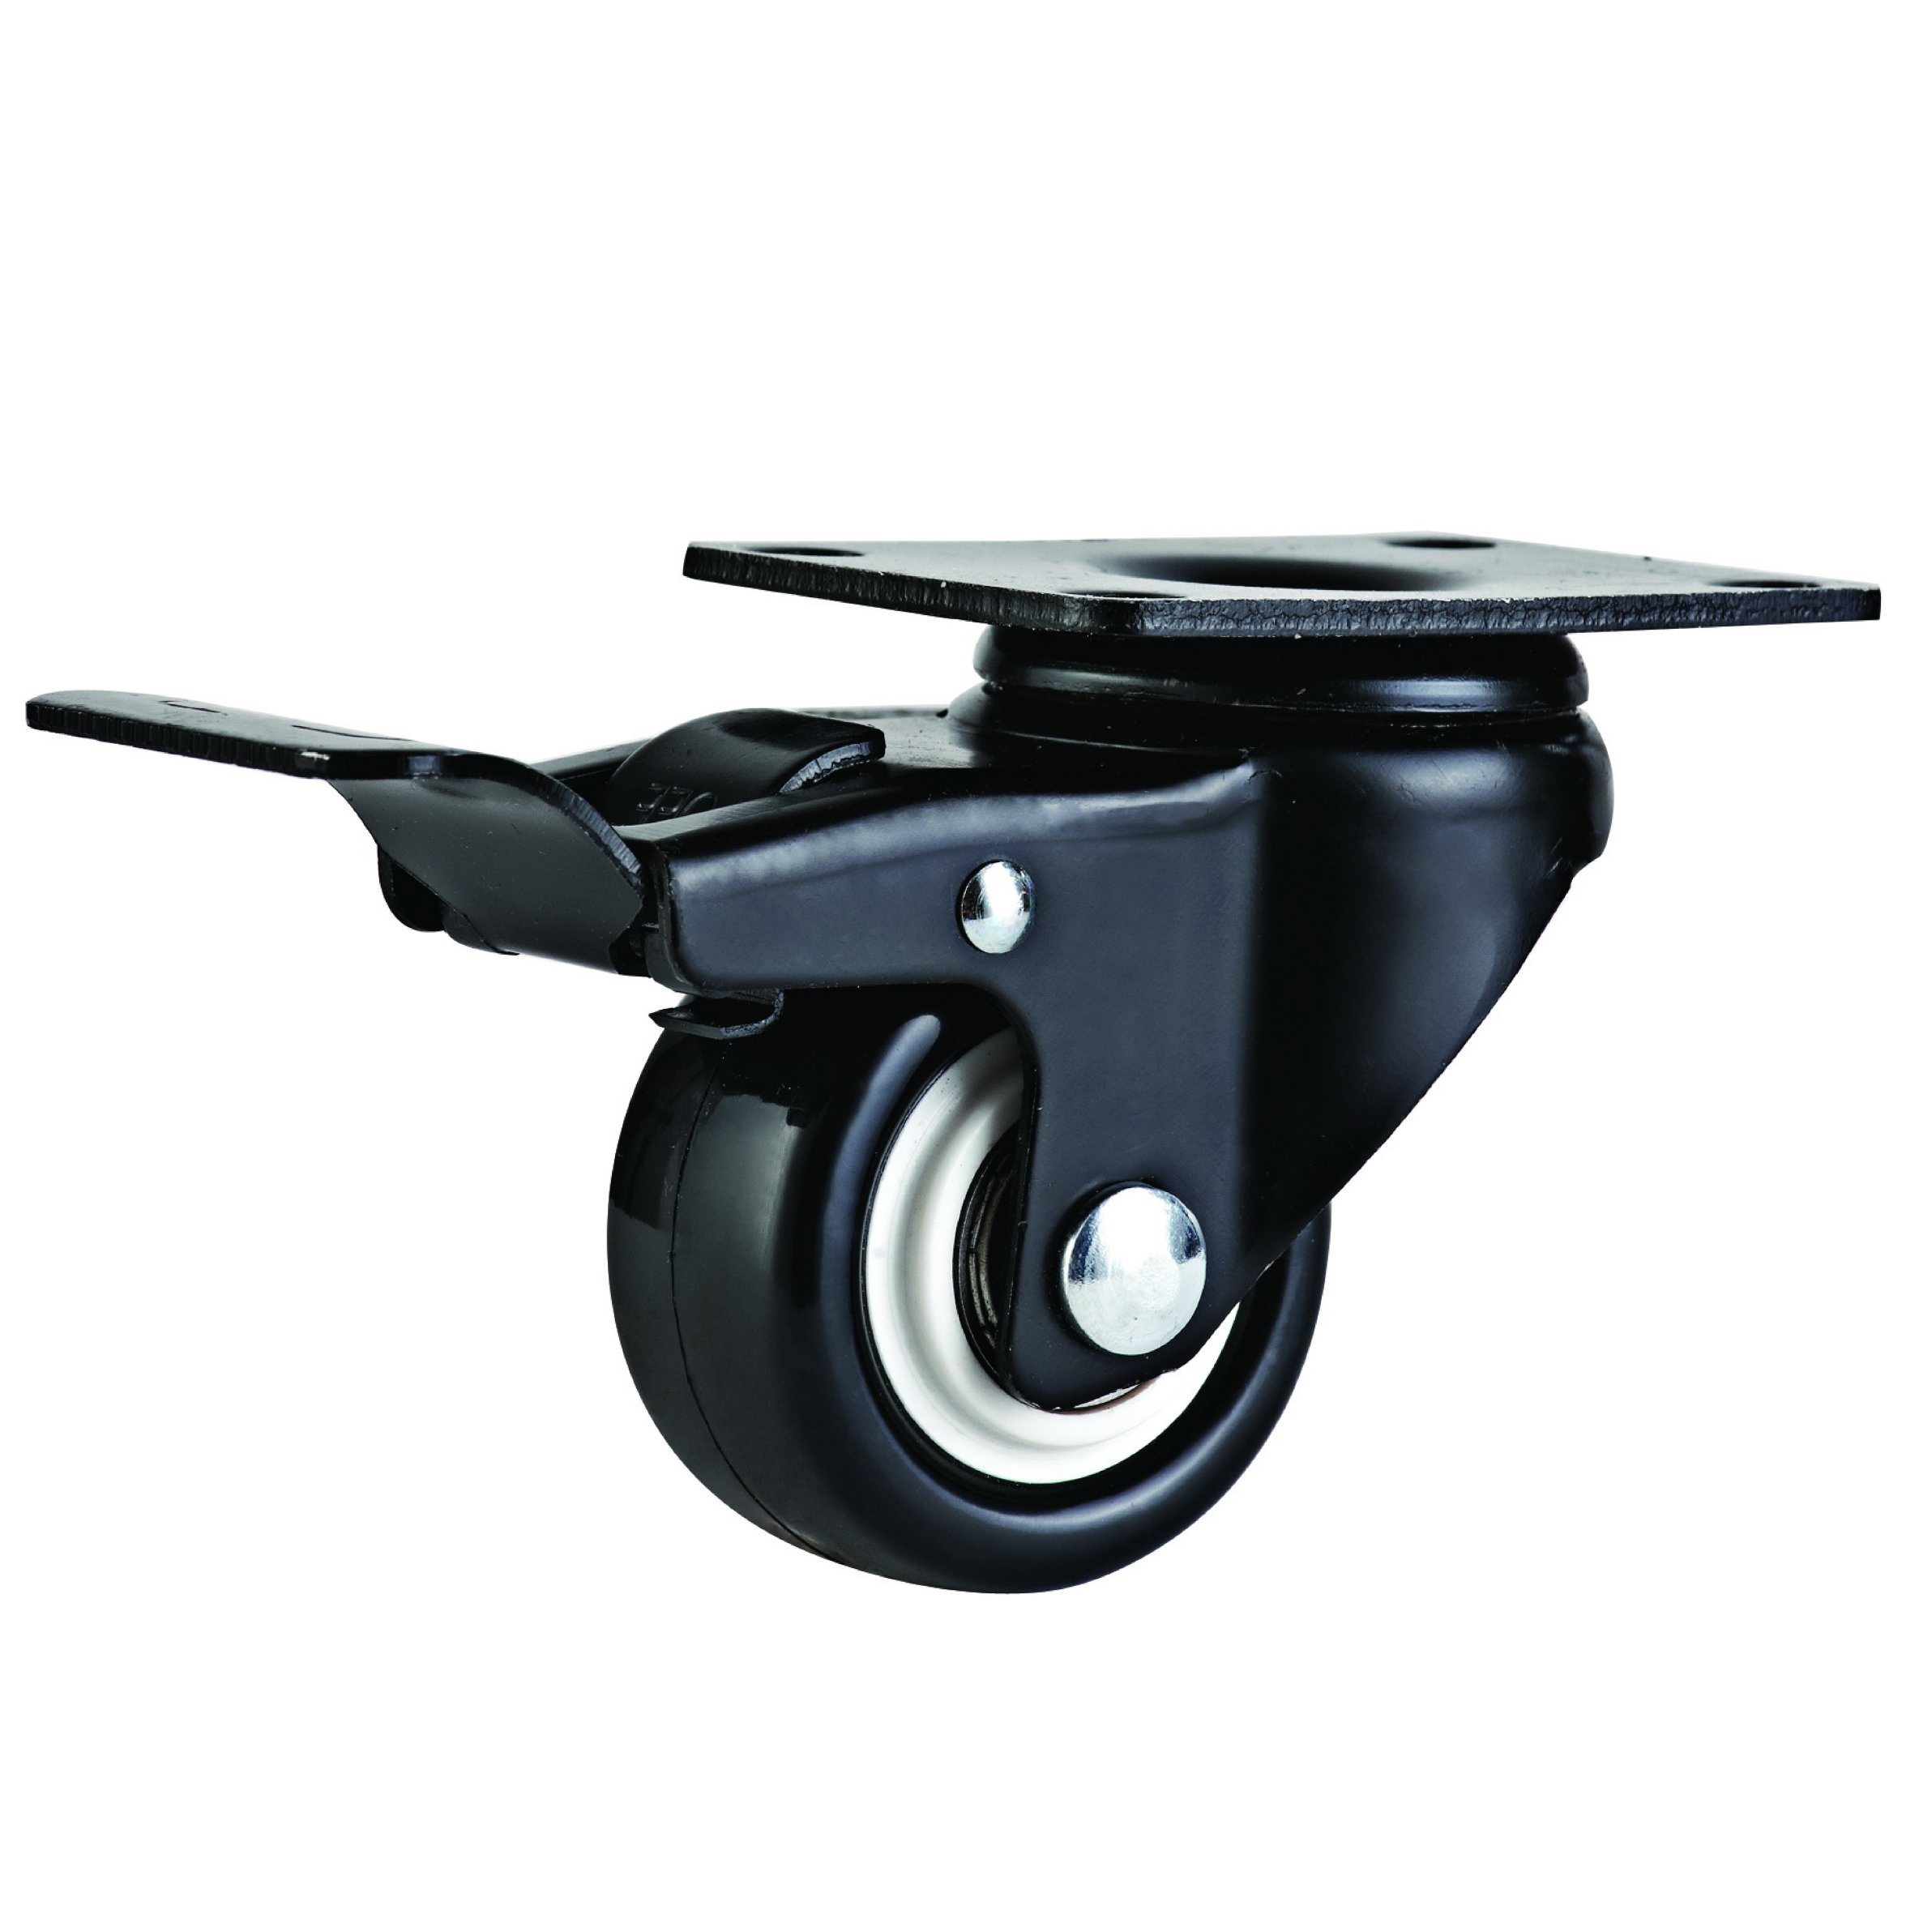 1.5-2.5 Inch Light Duty PVC Caster Wheel with E-Coating Bracket